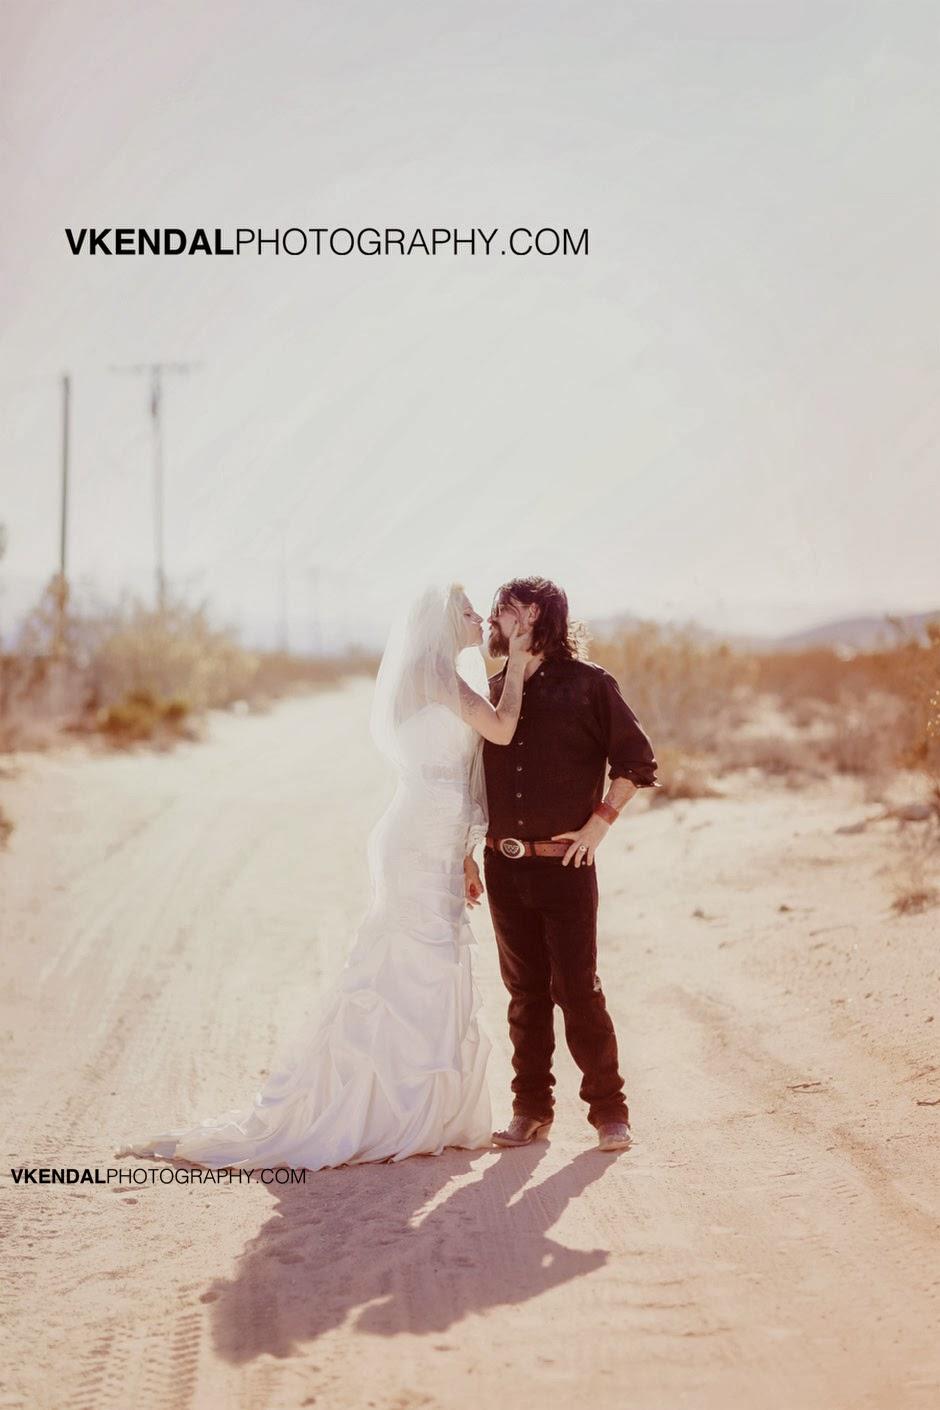 V Kendal Photography Shooter Waylon Jennings  Misty Swain Brooke  Desert Wedding  Joshua